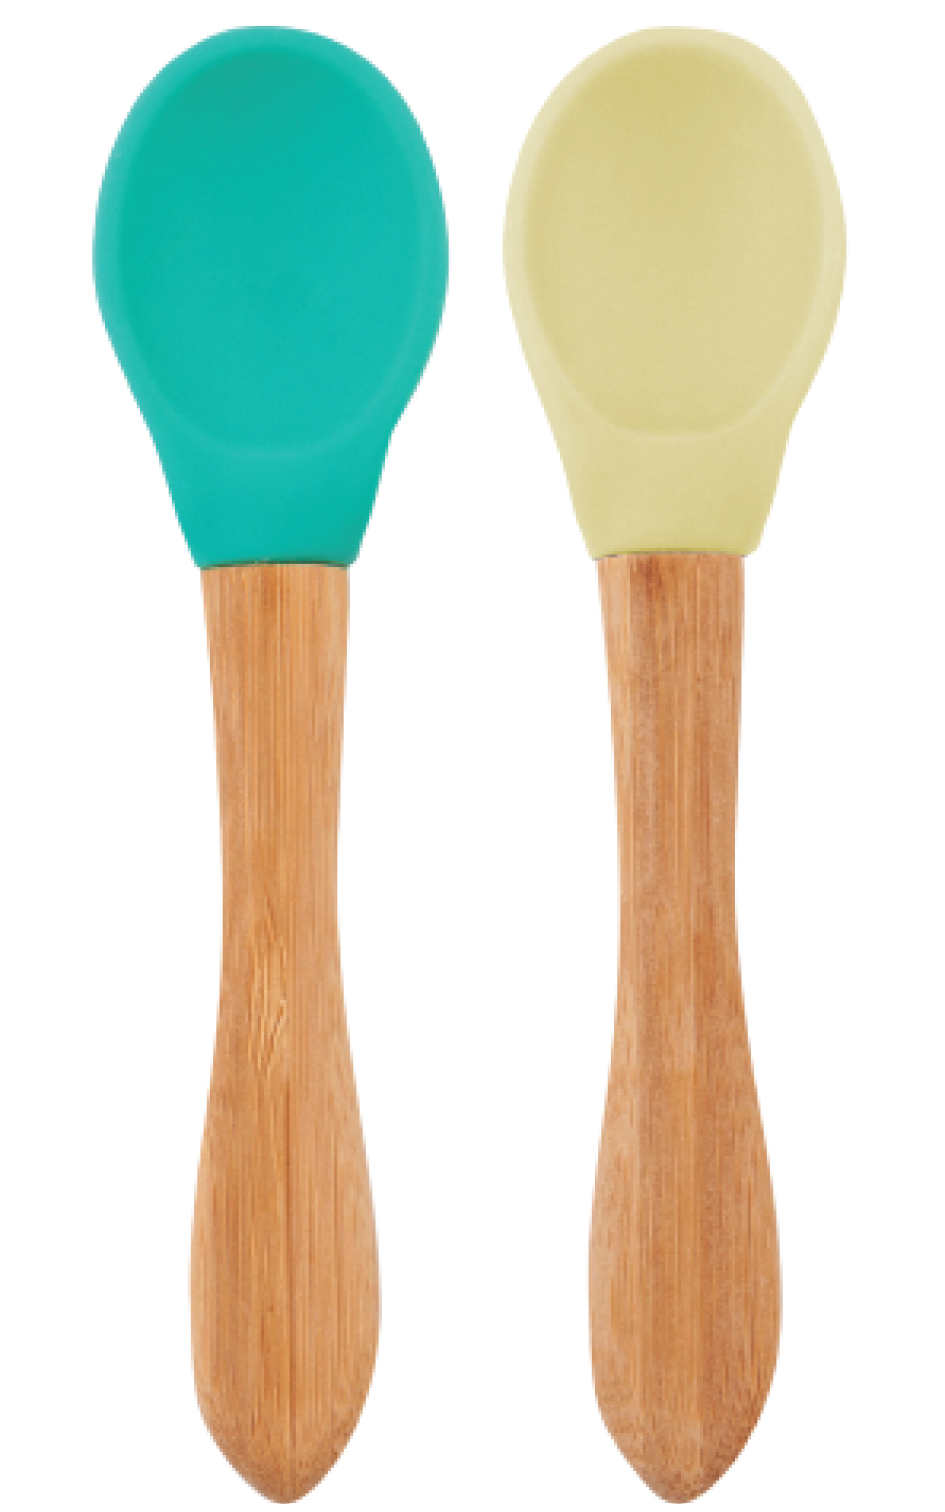 Lyžička s bambusovou rukoväťou 2ks - Green / Yellow